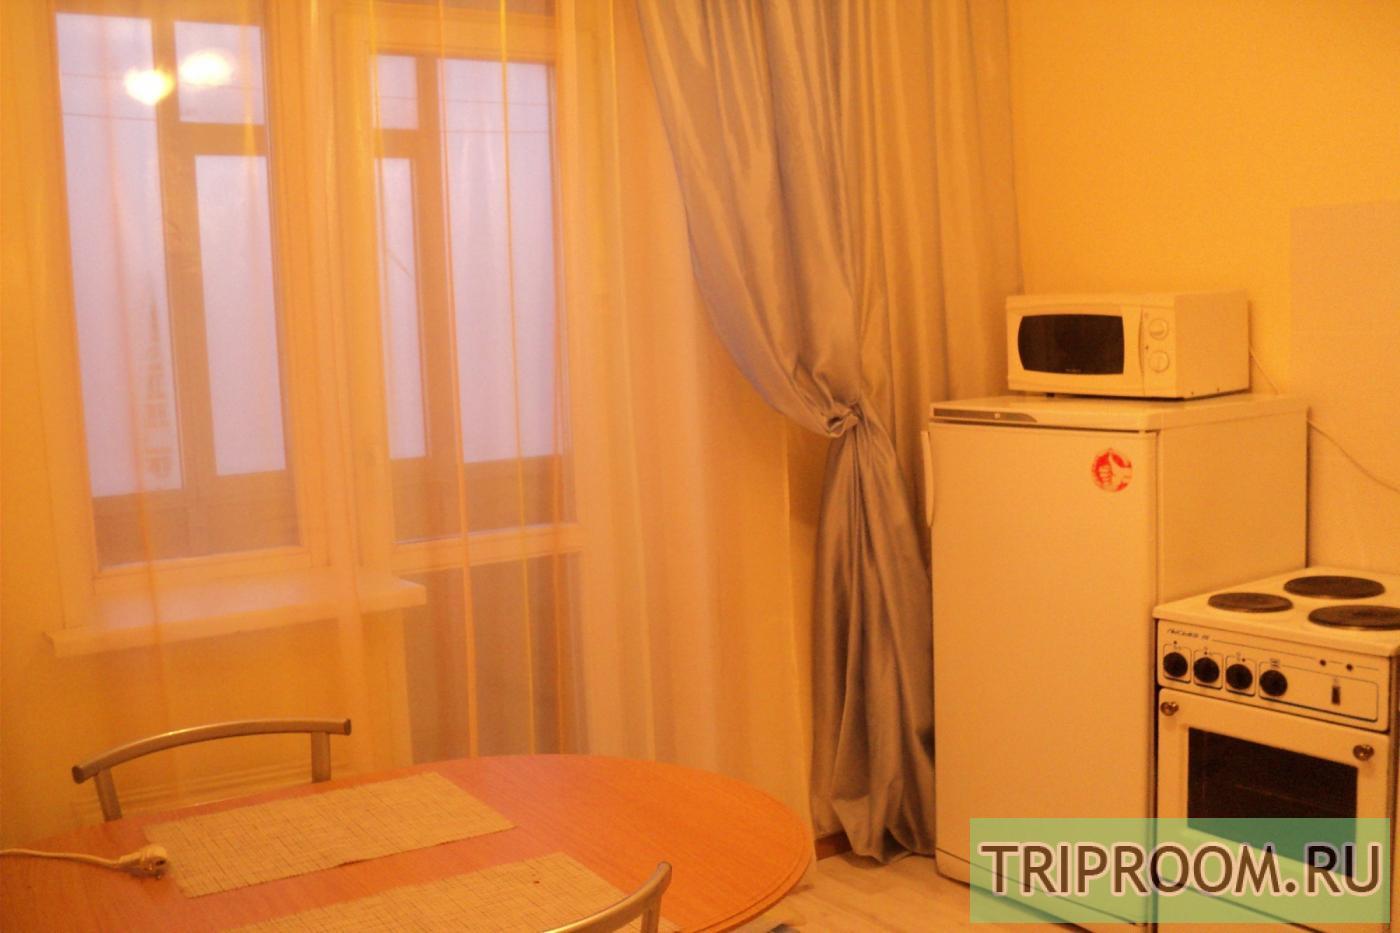 1-комнатная квартира посуточно (вариант № 5905), ул. Алексеева улица, фото № 7